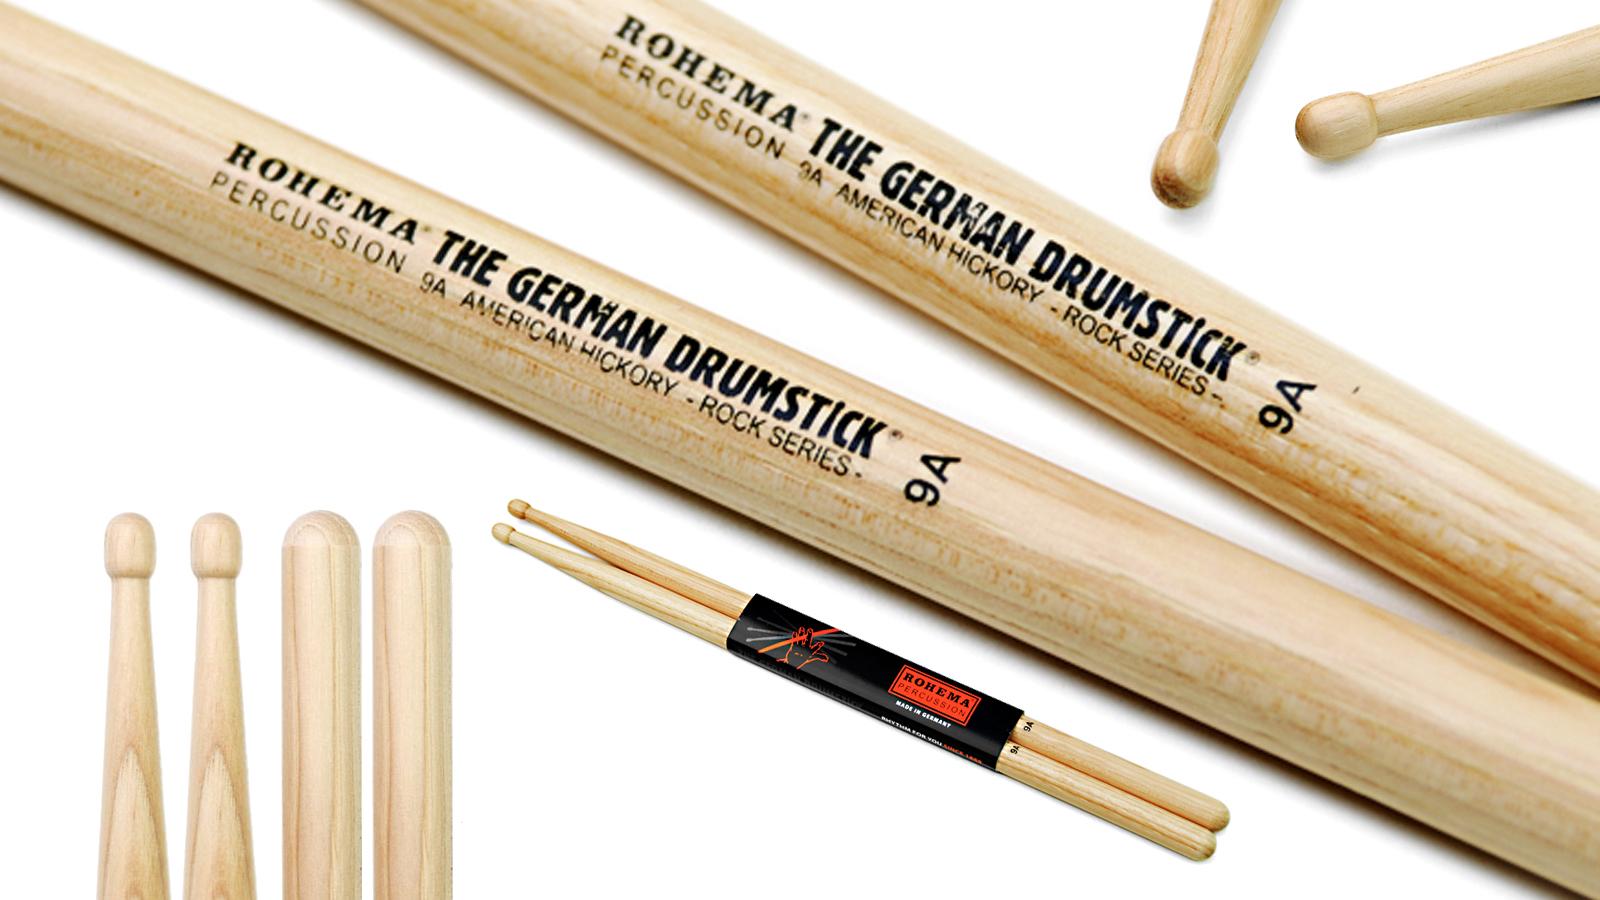 Rohema 61330/2 Sticks 9A